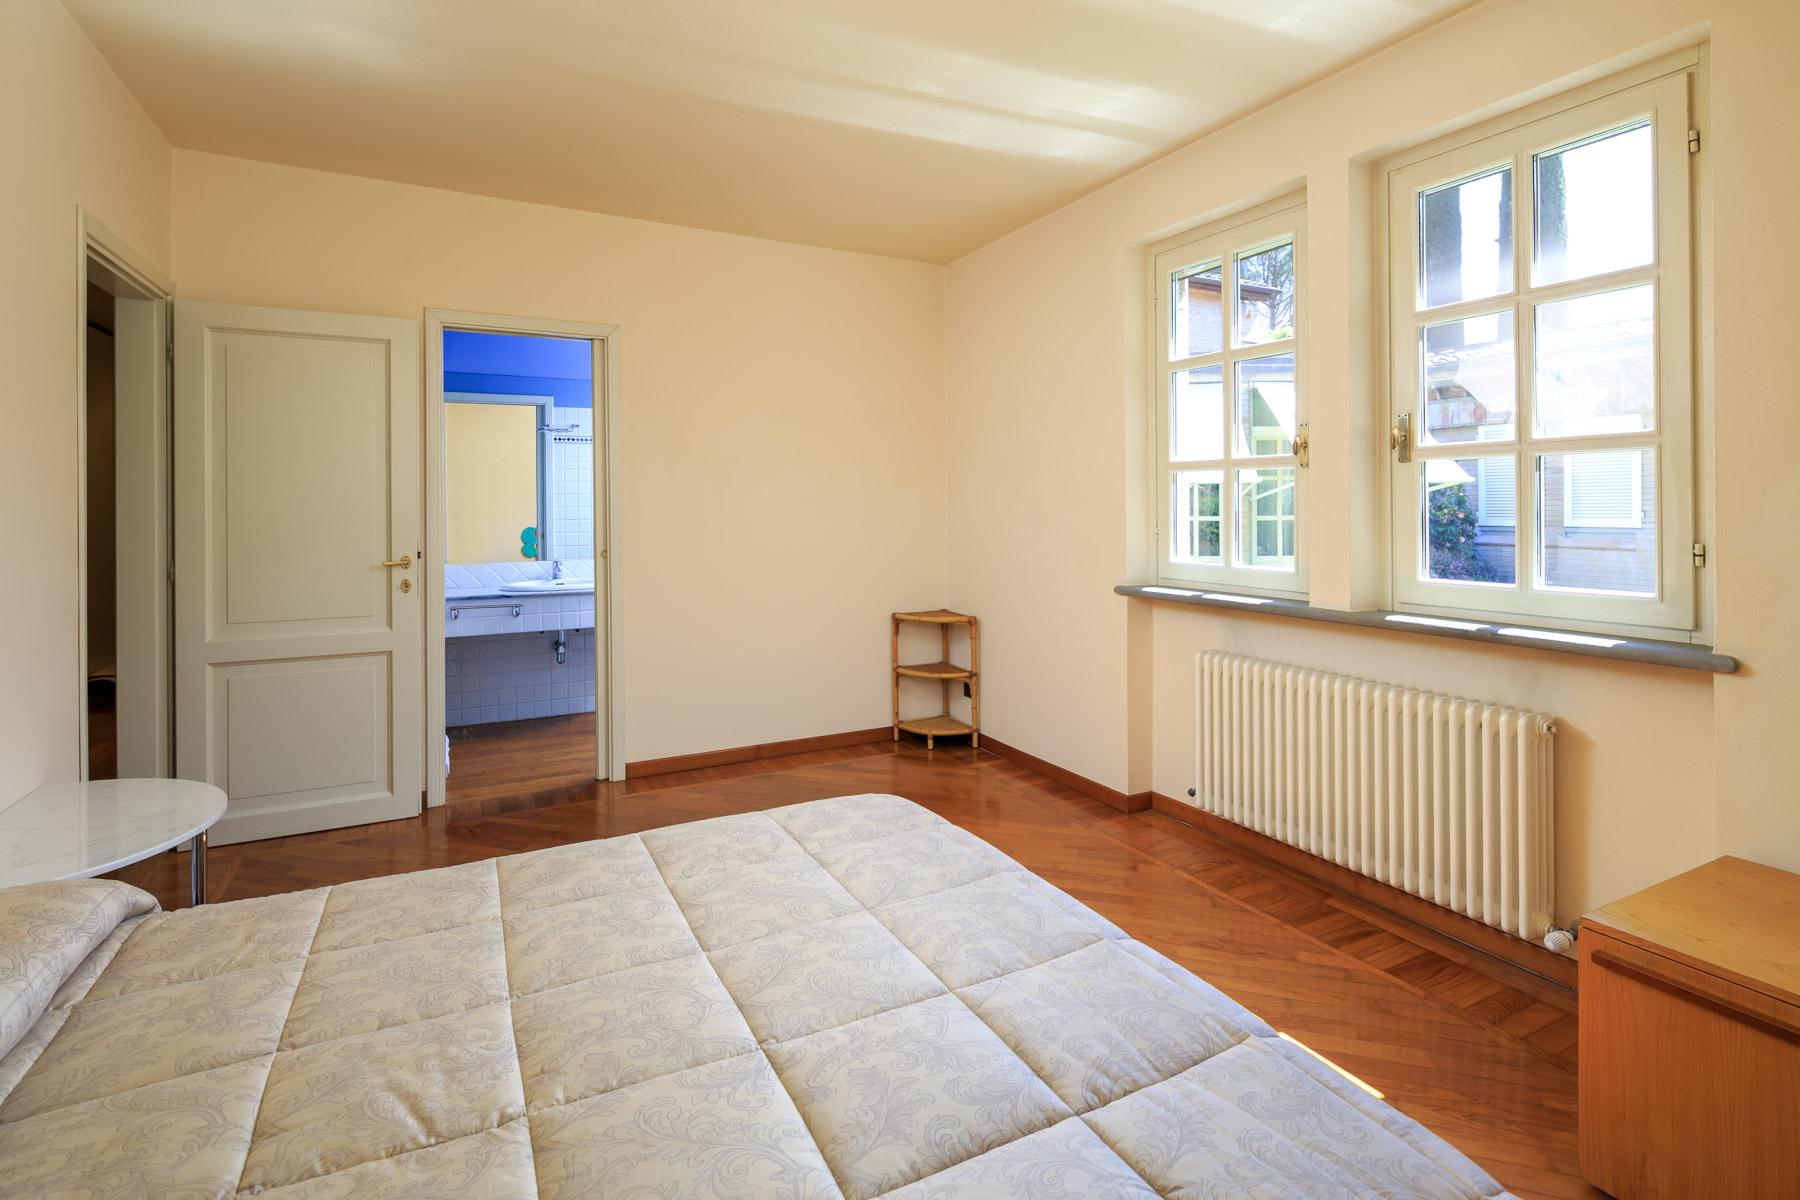 Villa in Vendita a Lucca: 5 locali, 500 mq - Foto 11